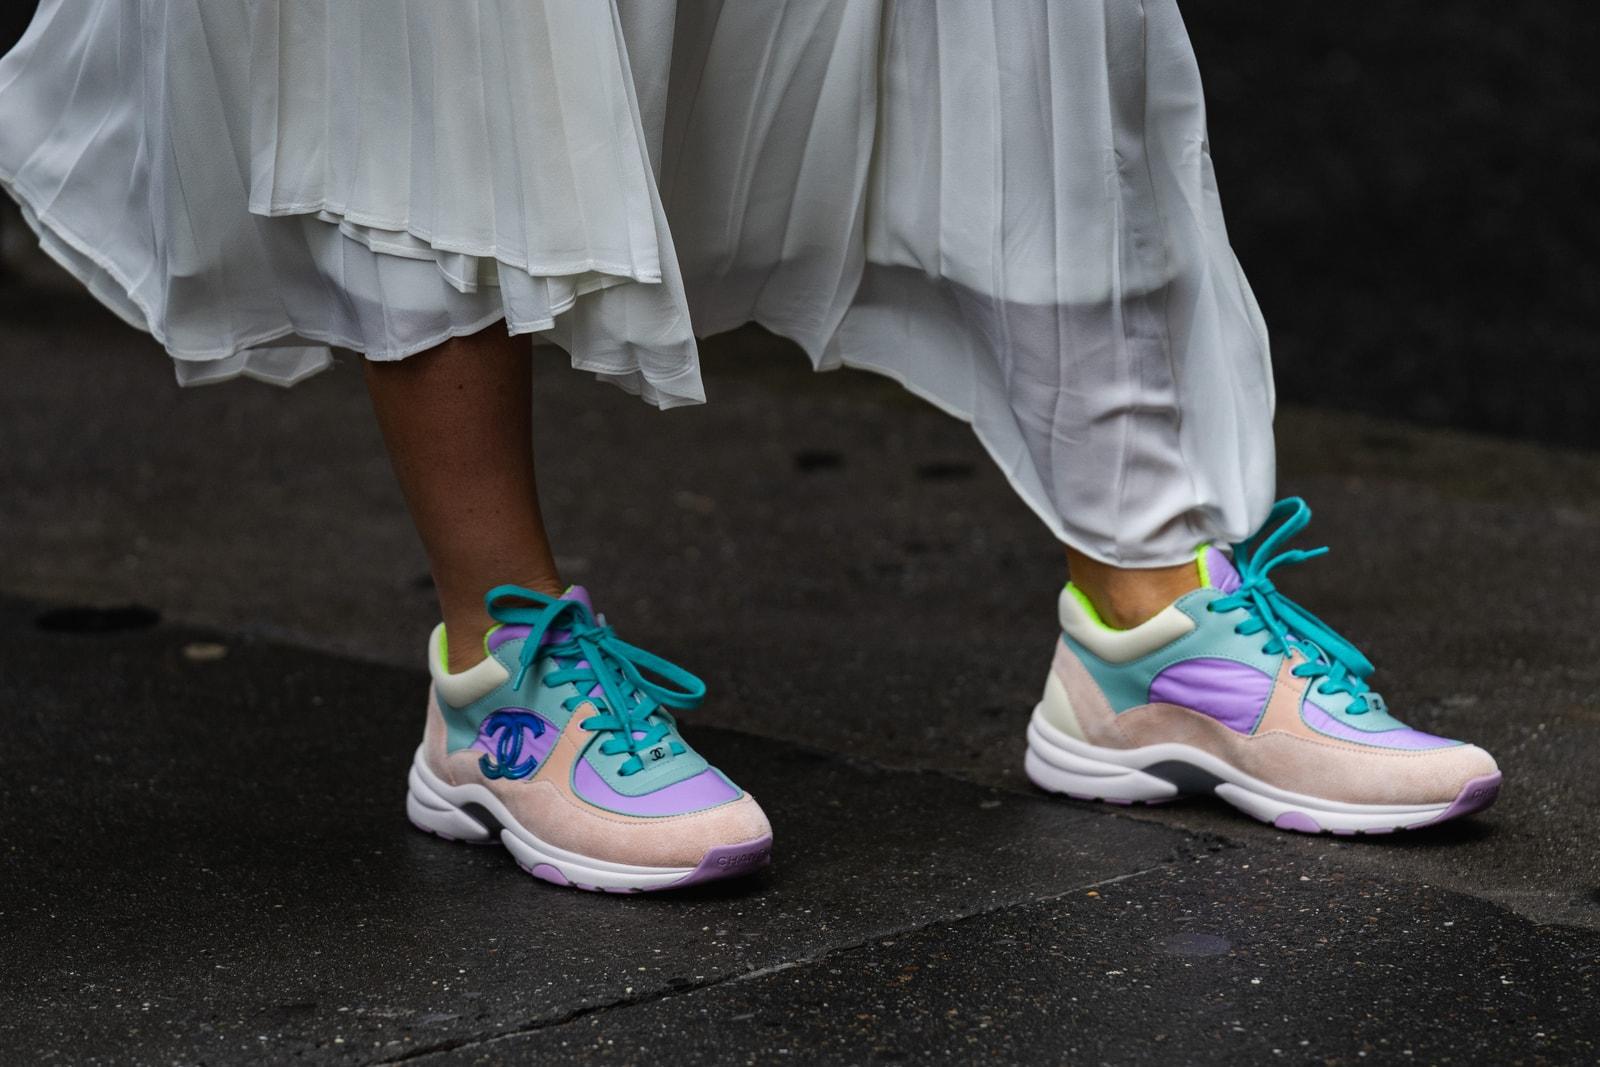 Fashion week New York paris London Milan popular sneakers street style 2019 Nike dior come des garçons prada